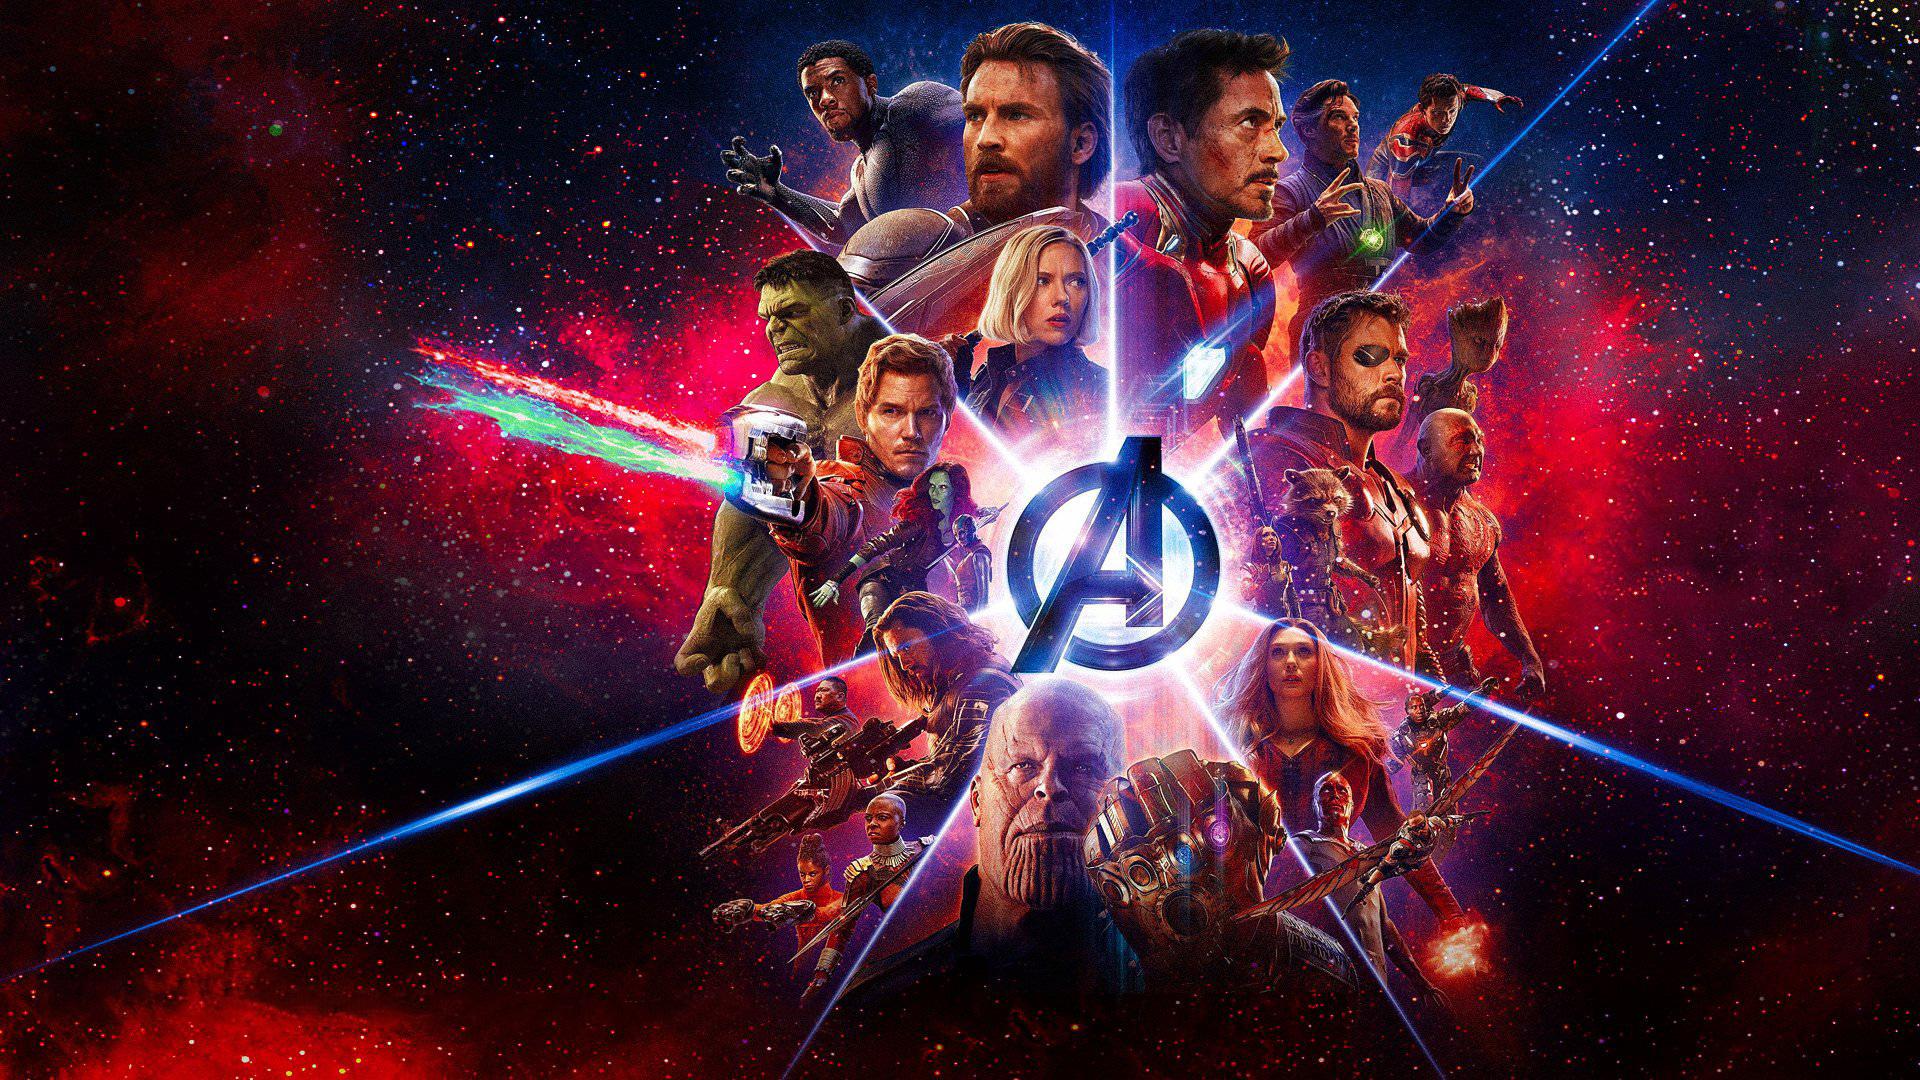 1920x1080 Avengers Infinity War Movie Imax Poster Laptop Full Hd